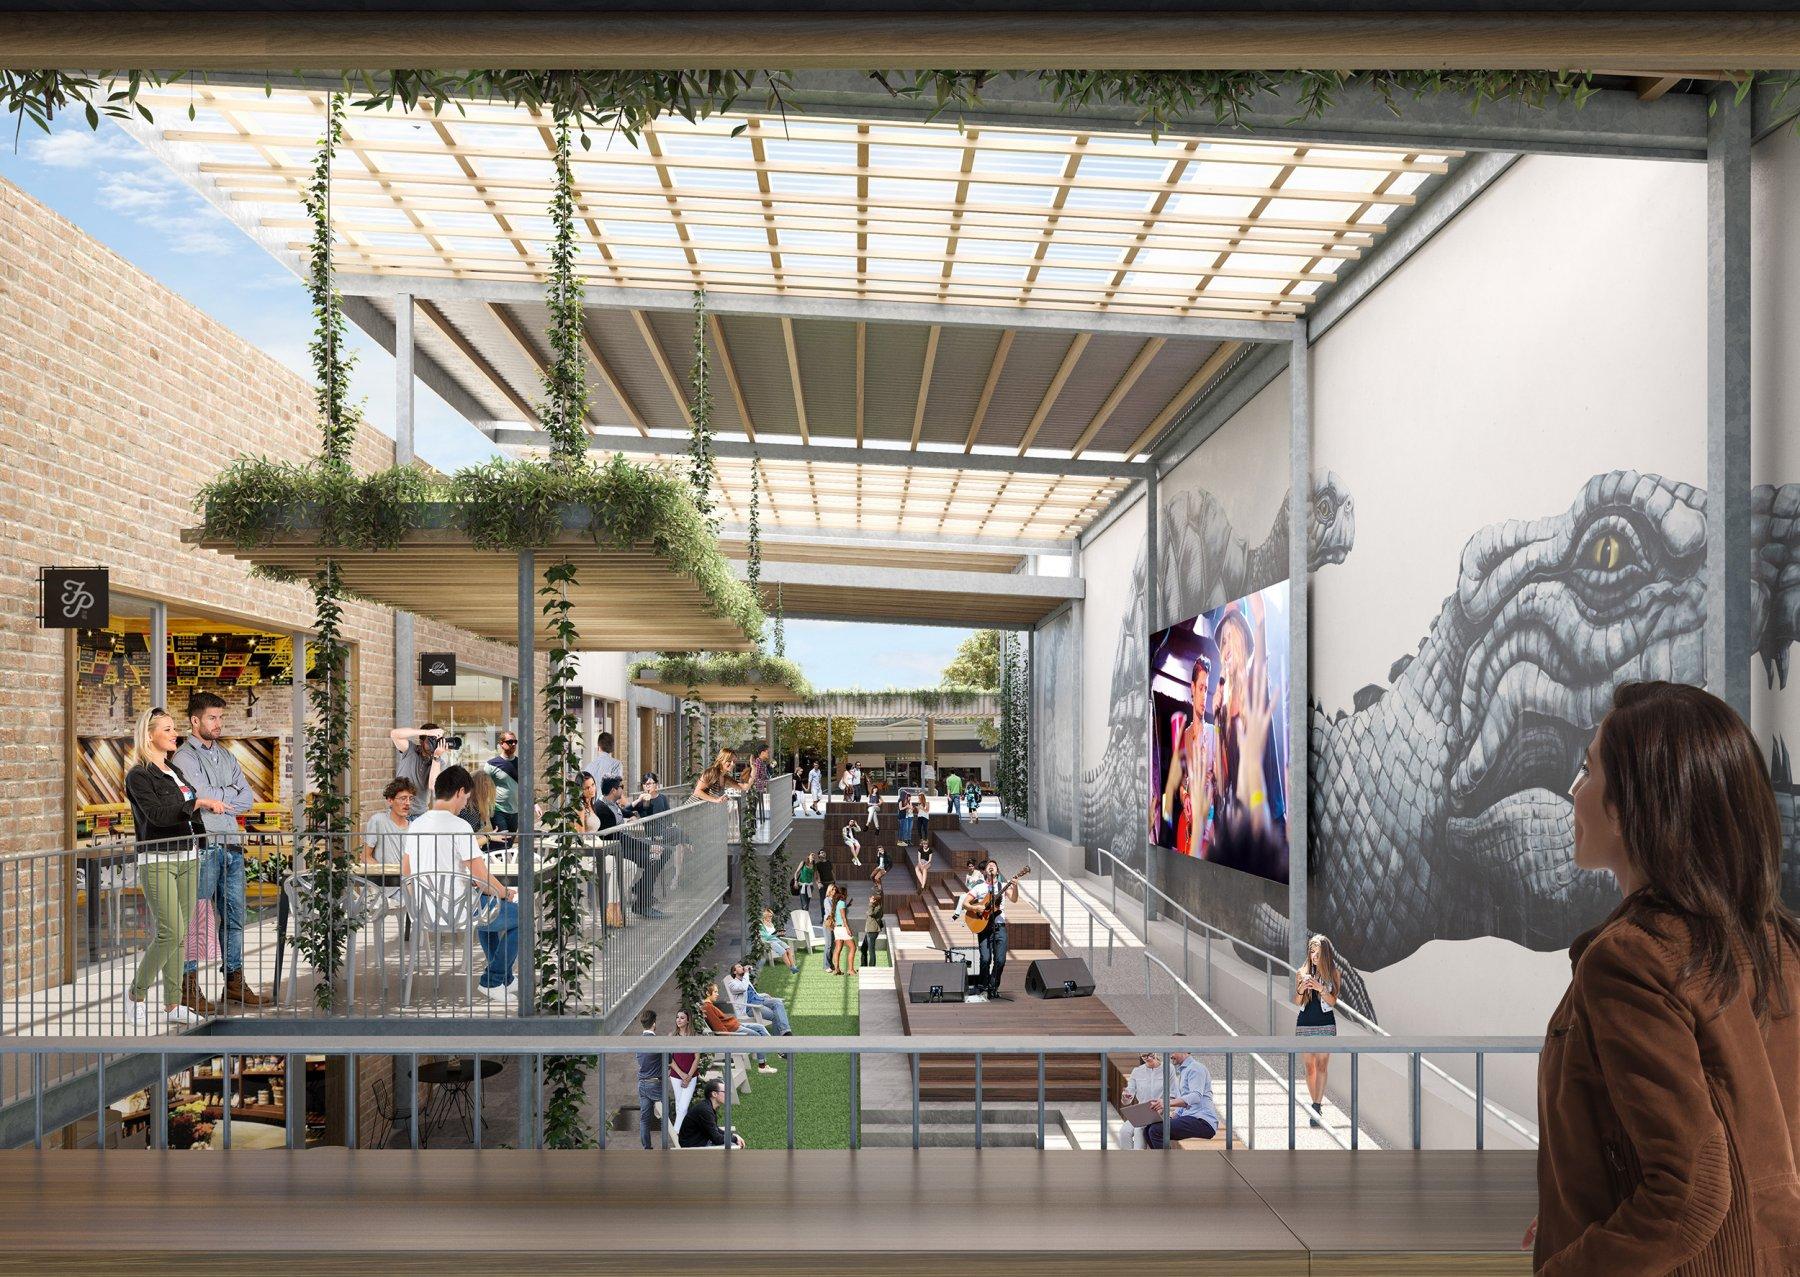 Cavill Architects, Commercial Architects Brisbane, Flinders Lane Townsville, Brisbane Architecture, Brisbane Architects